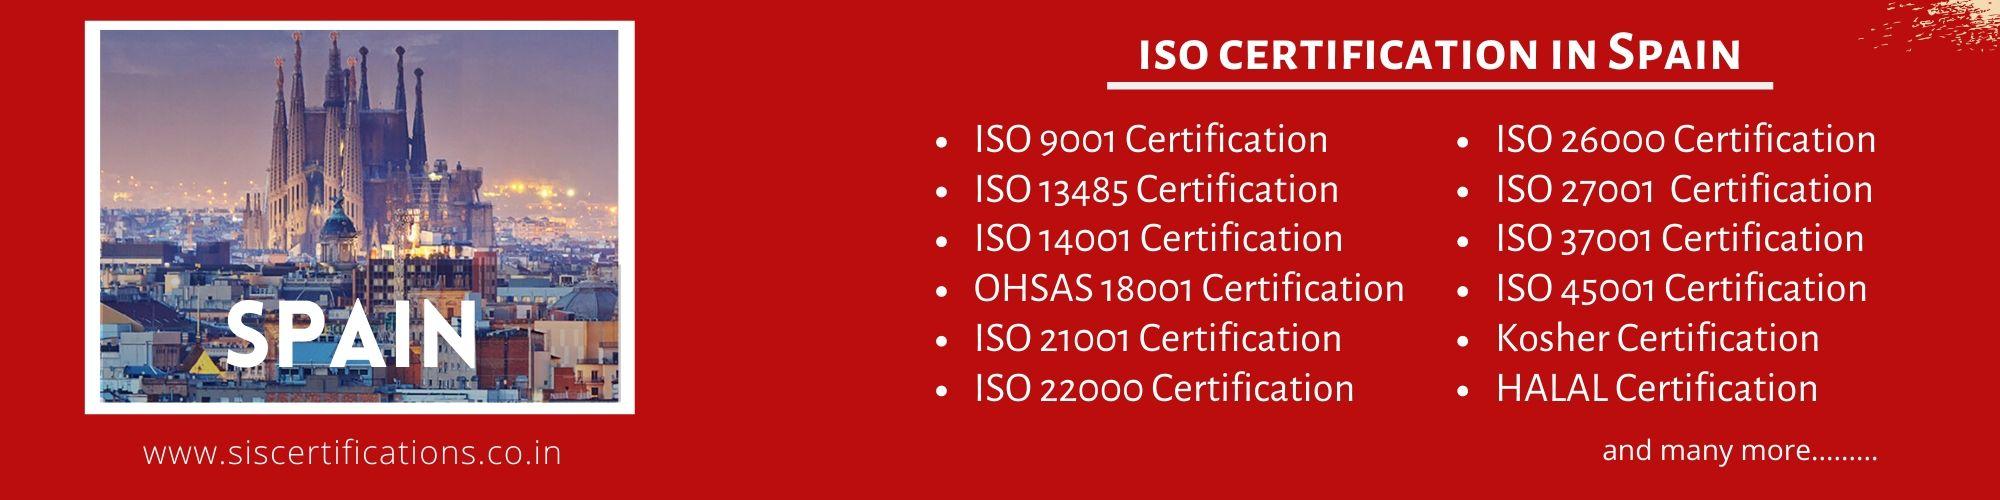 ISO Certification in Spain